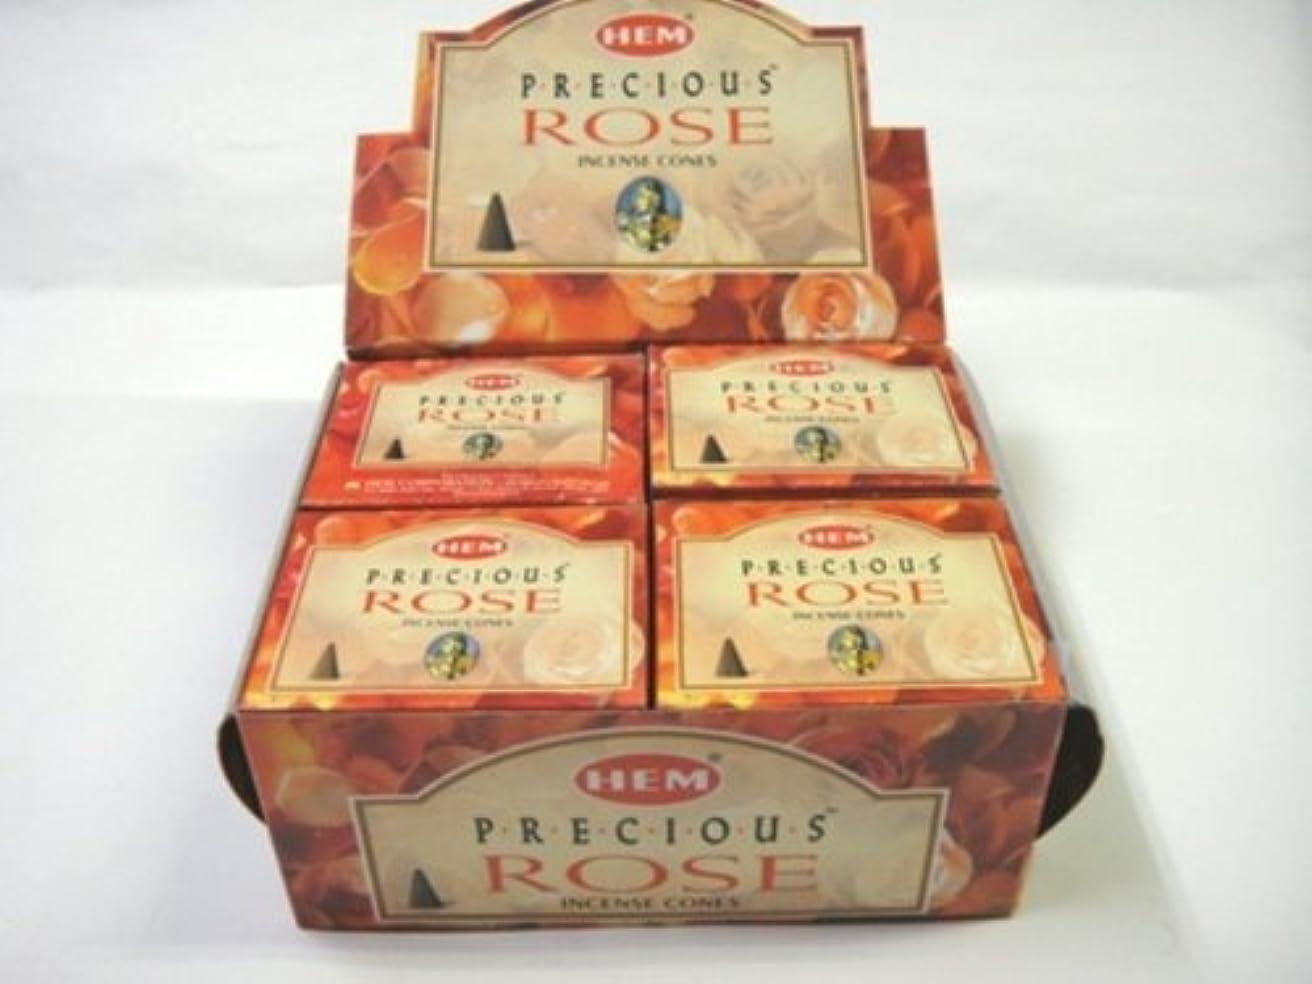 HEM お香 プレシャスローズ コーンタイプ 1ケース(12箱入り) お香薔薇